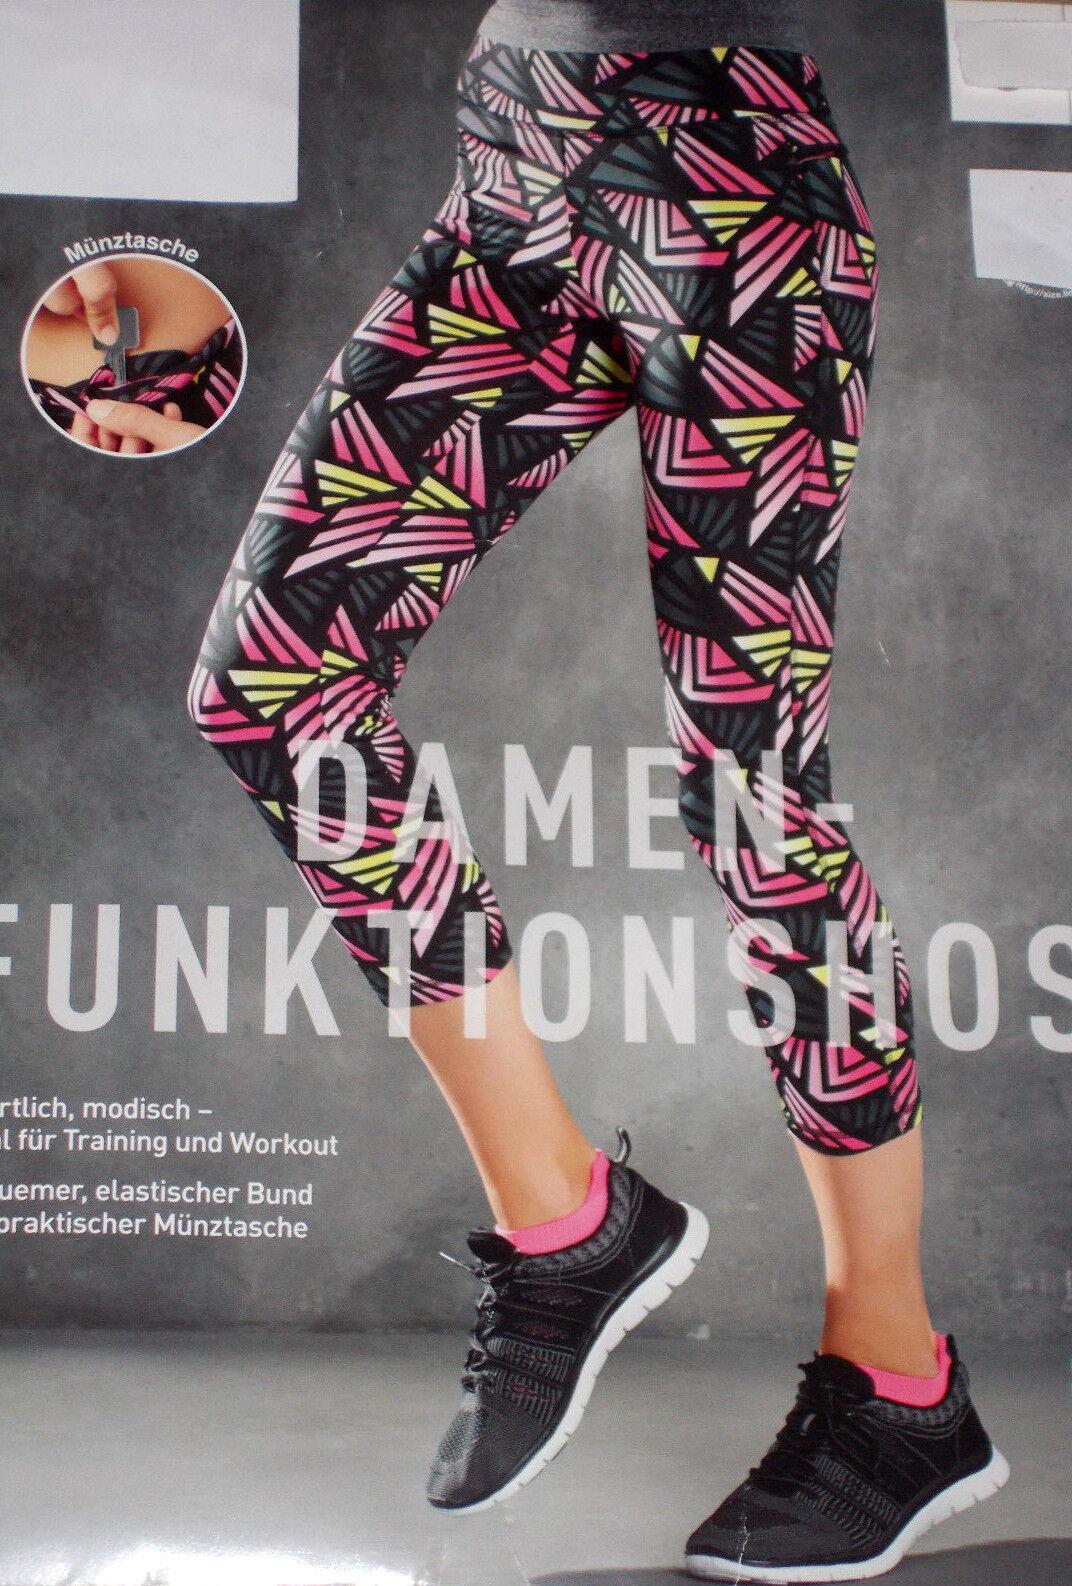 Damen Stretch FUNKTIONSHOSE 7/8 Länge Fitnesshose Laufhose Gr.S L NEU